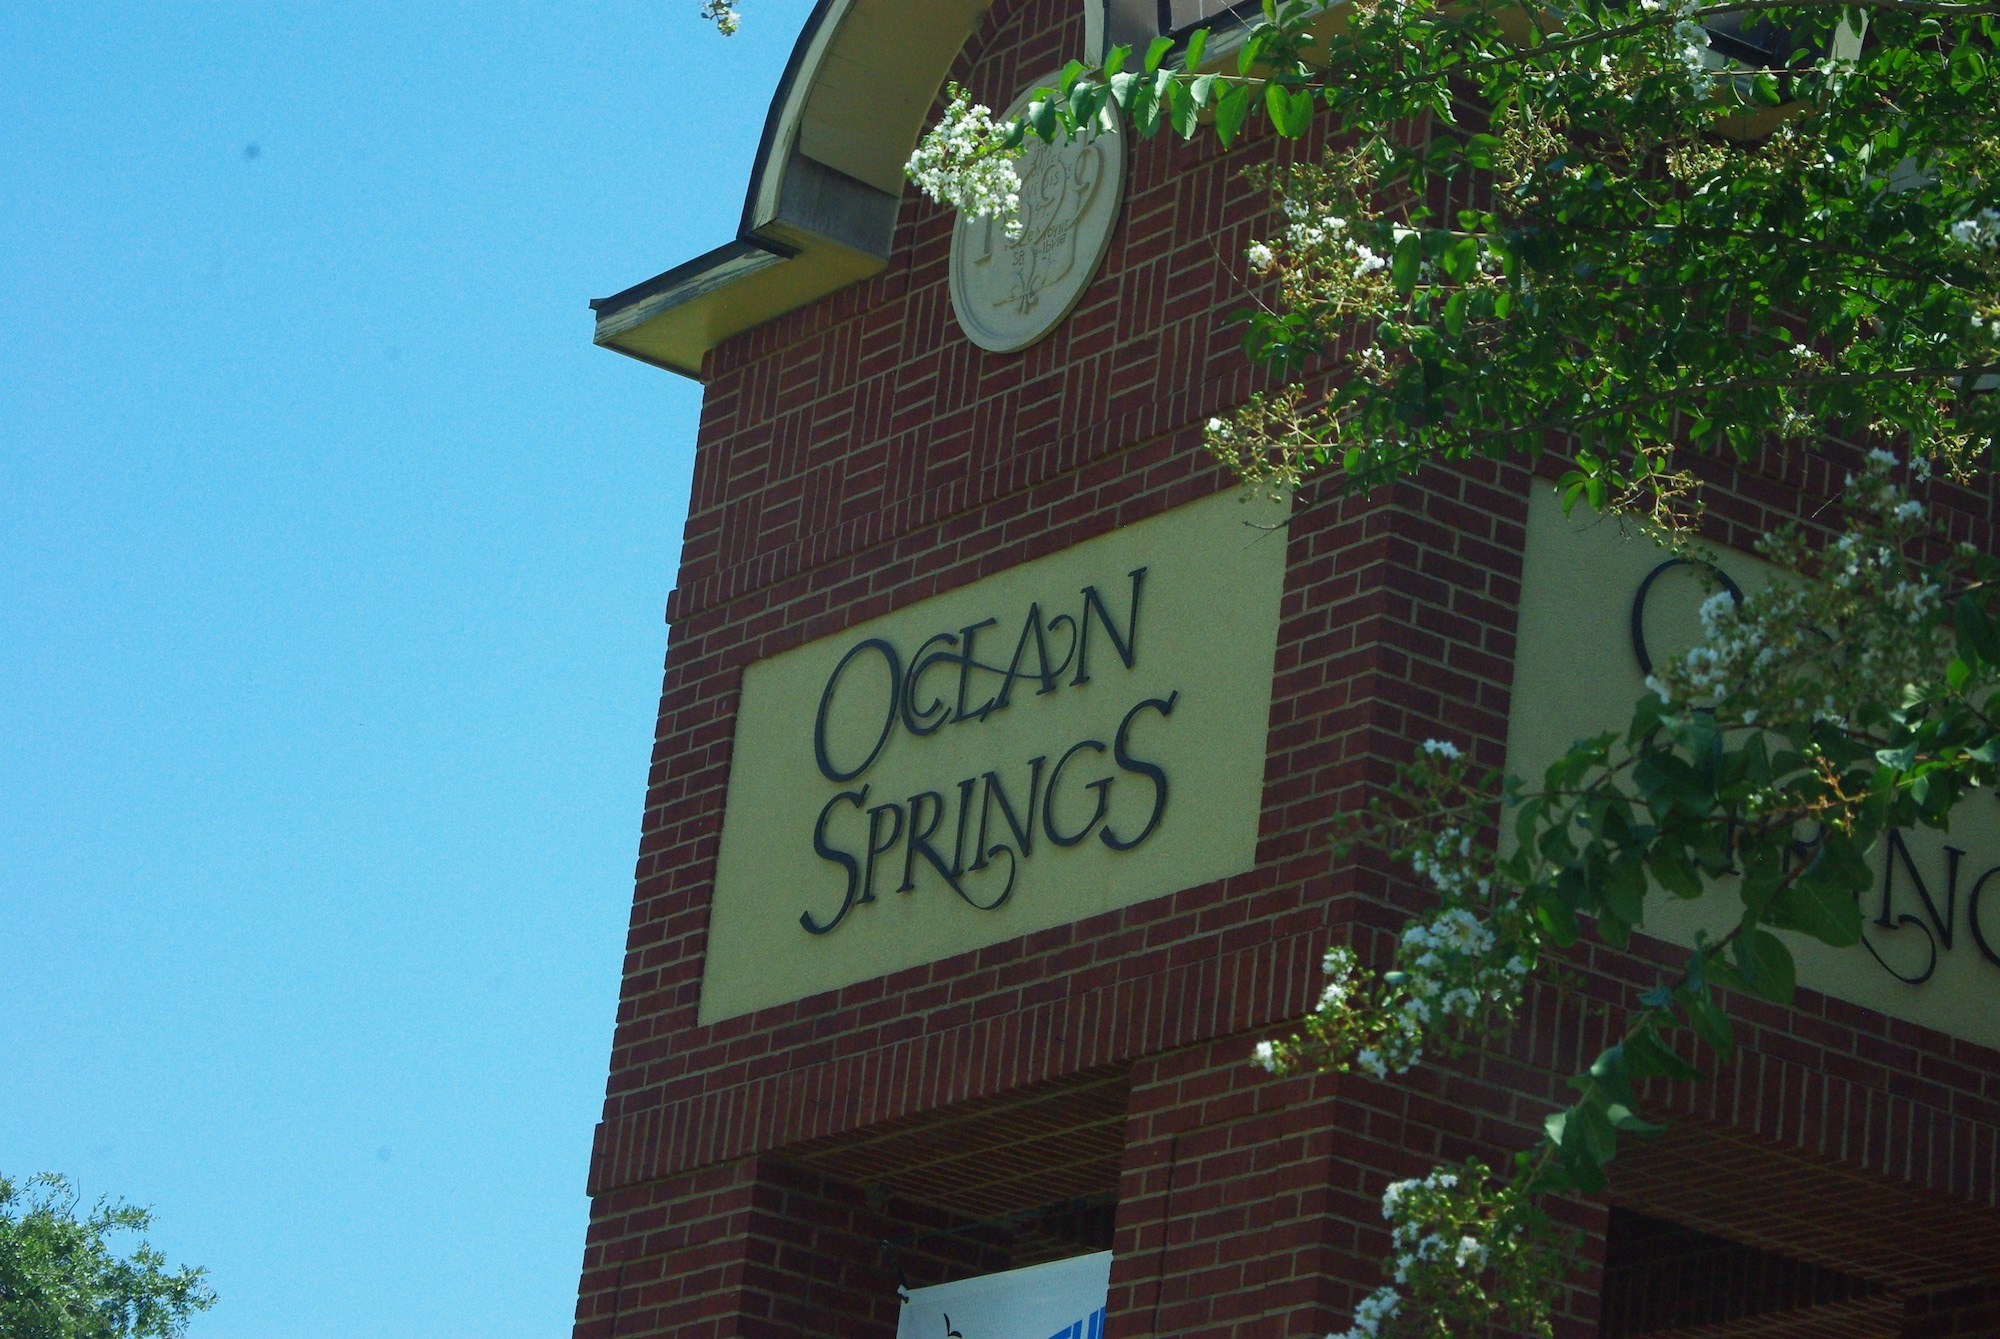 Le coin s'appelle donc Ocean Springs